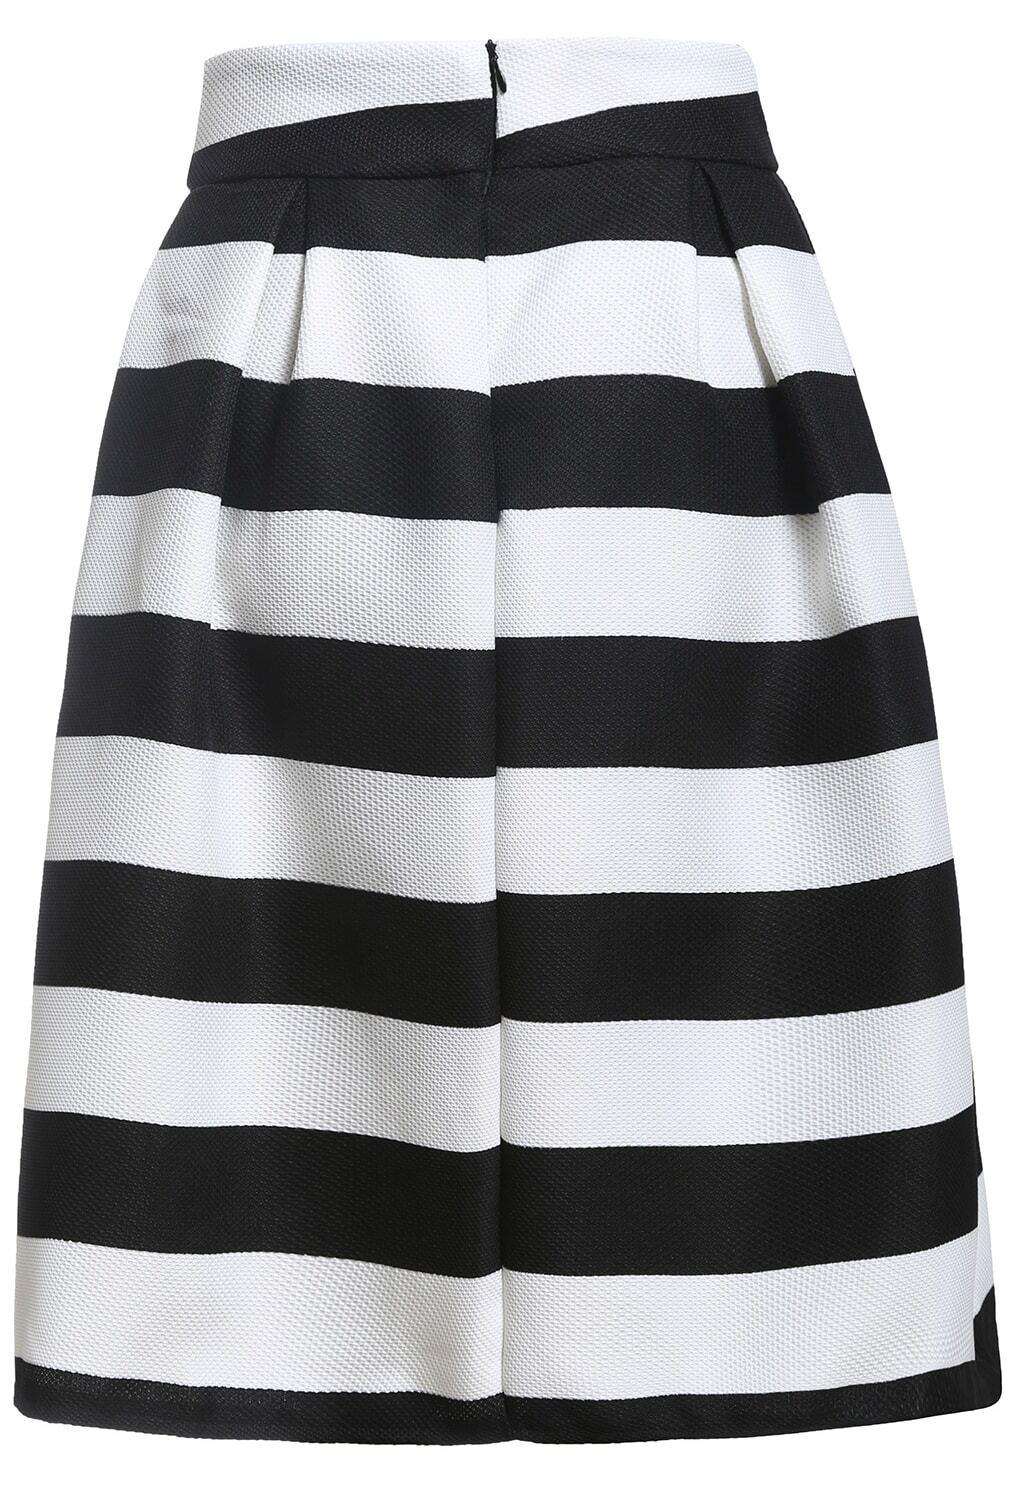 28f6732a08 Short Flared Skirts Buy Online | Saddha